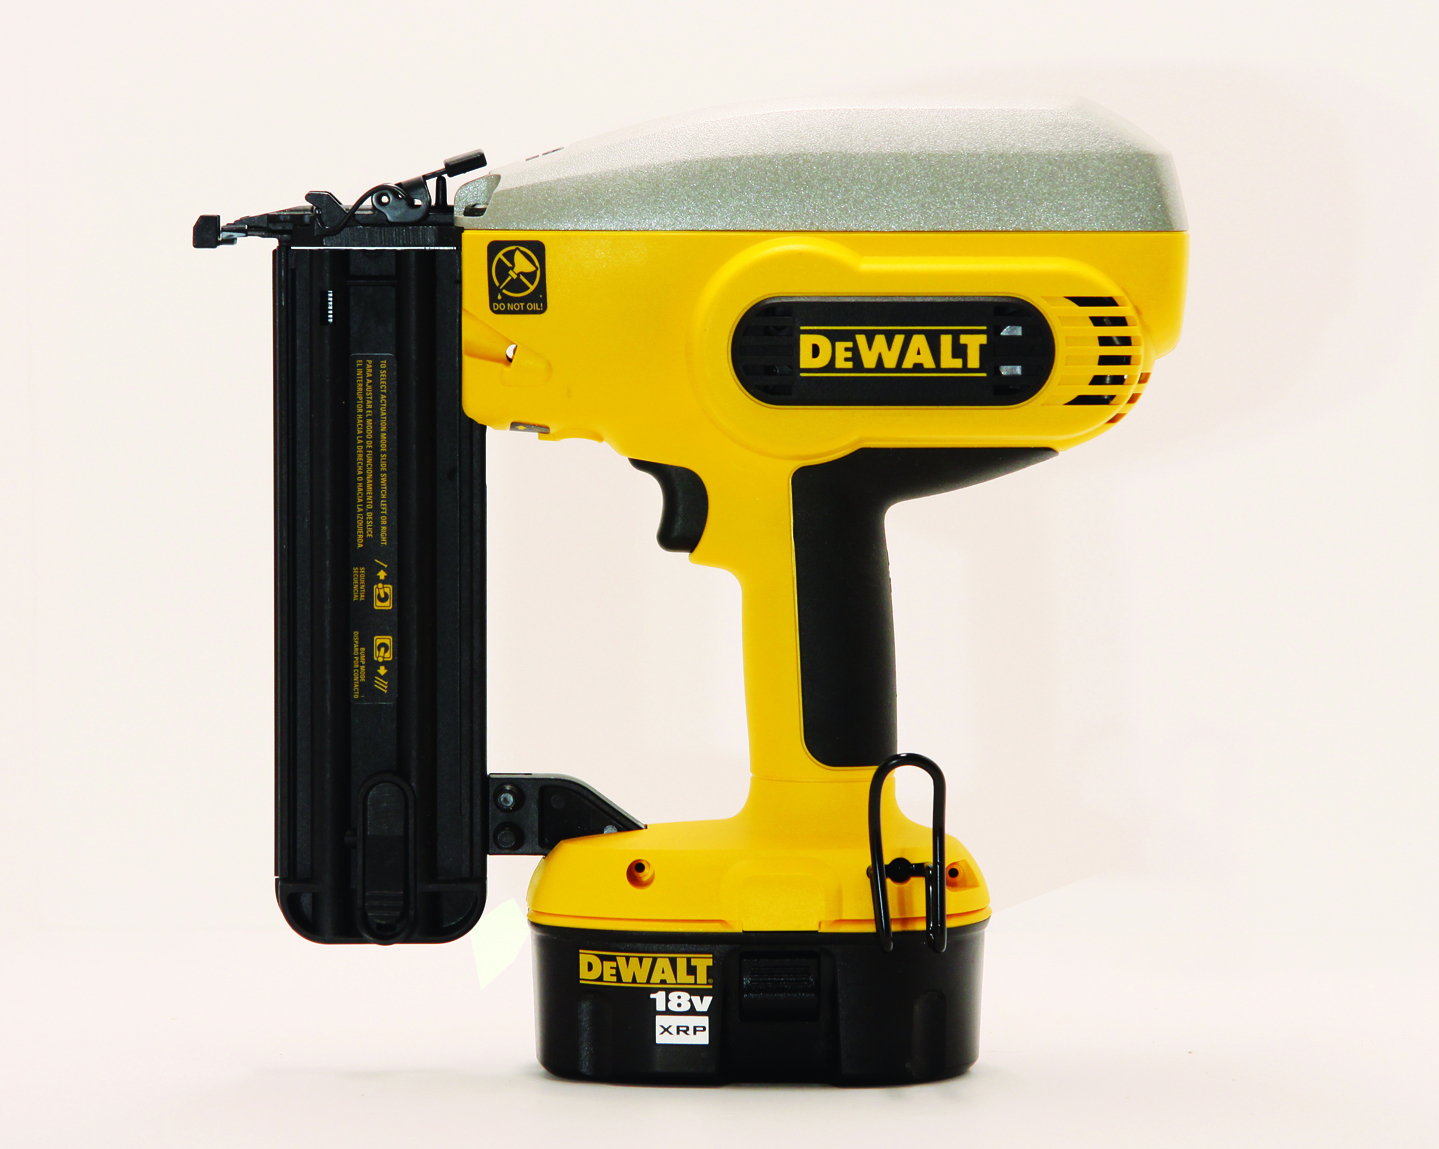 Dewalt Dc608k Cordless Brad Nailer Tools Of The Trade